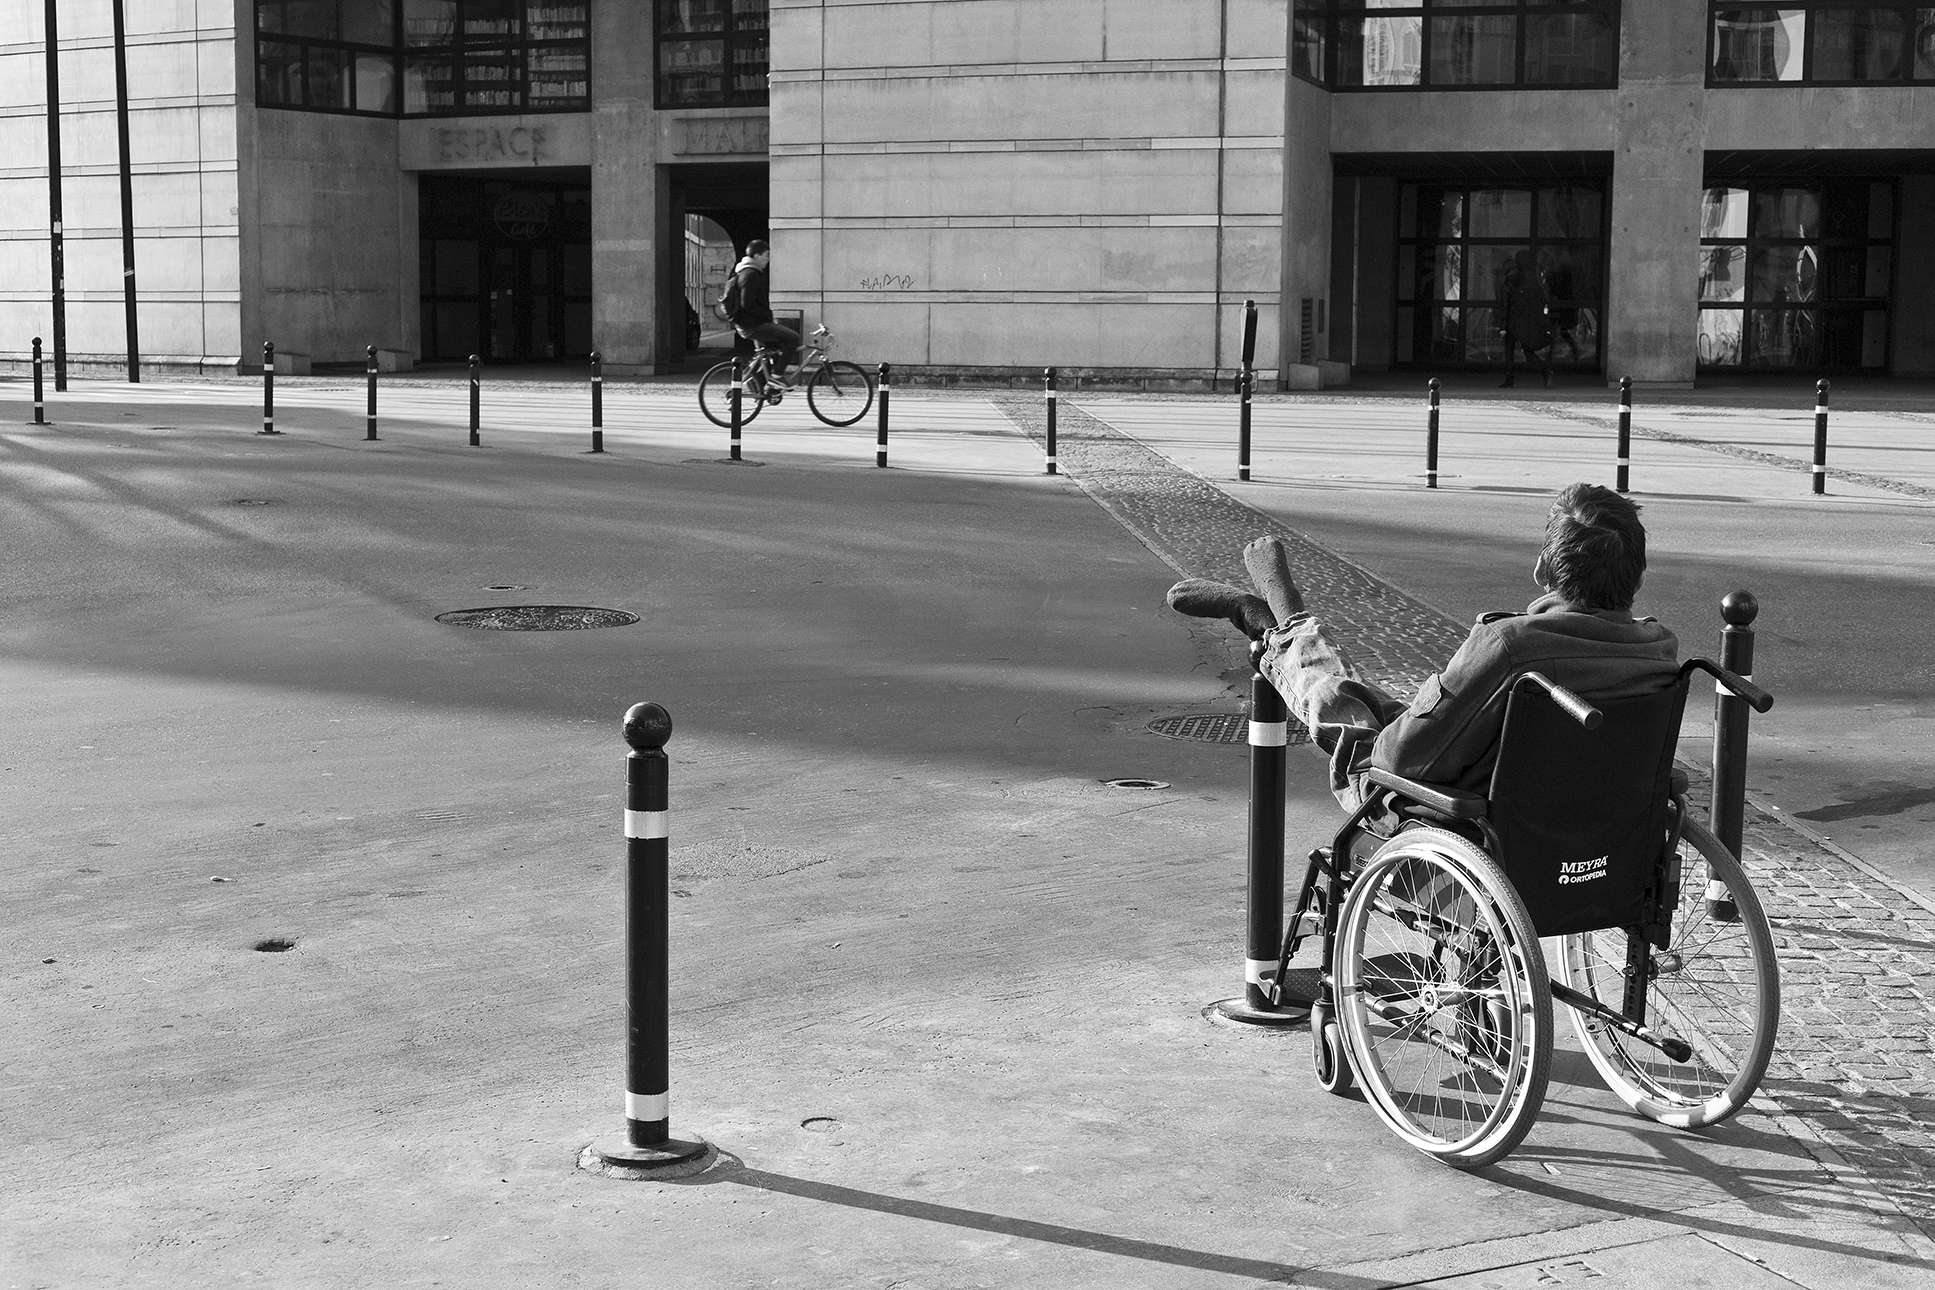 deux-roues-chambery-mars-2012.jpg